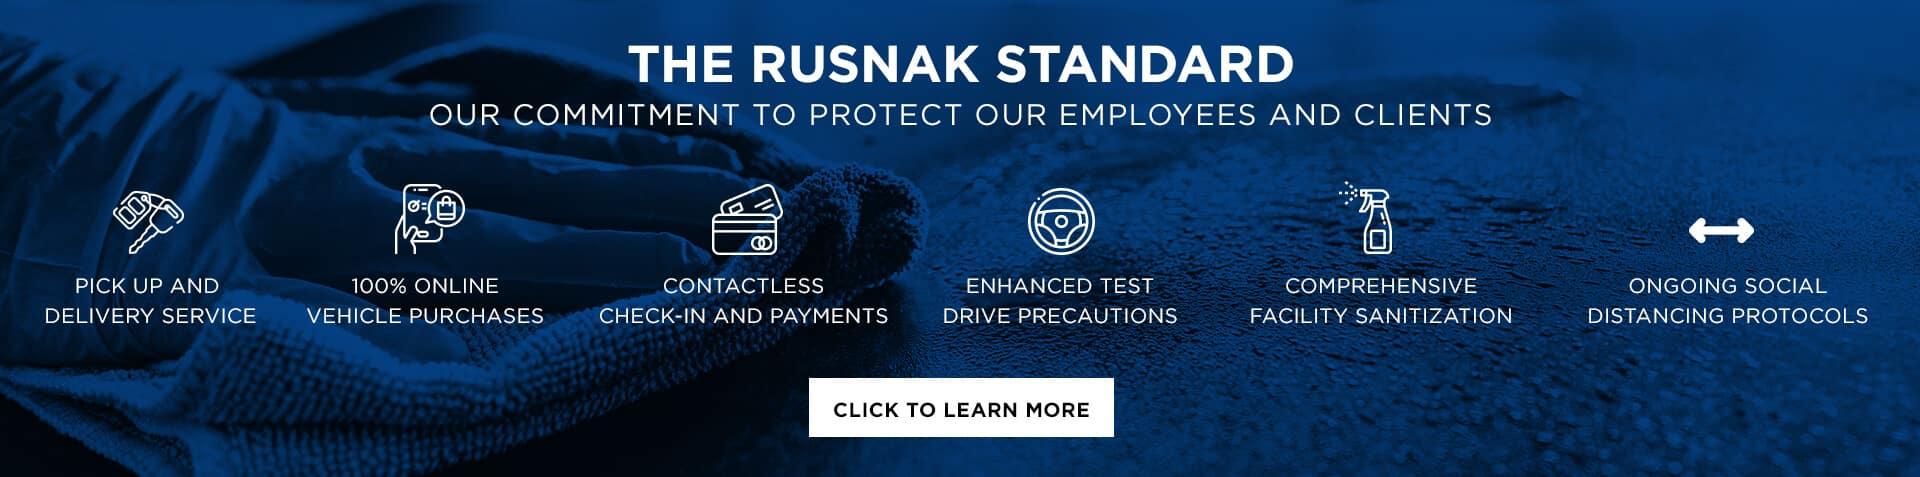 Rusnak Standard banner graphic